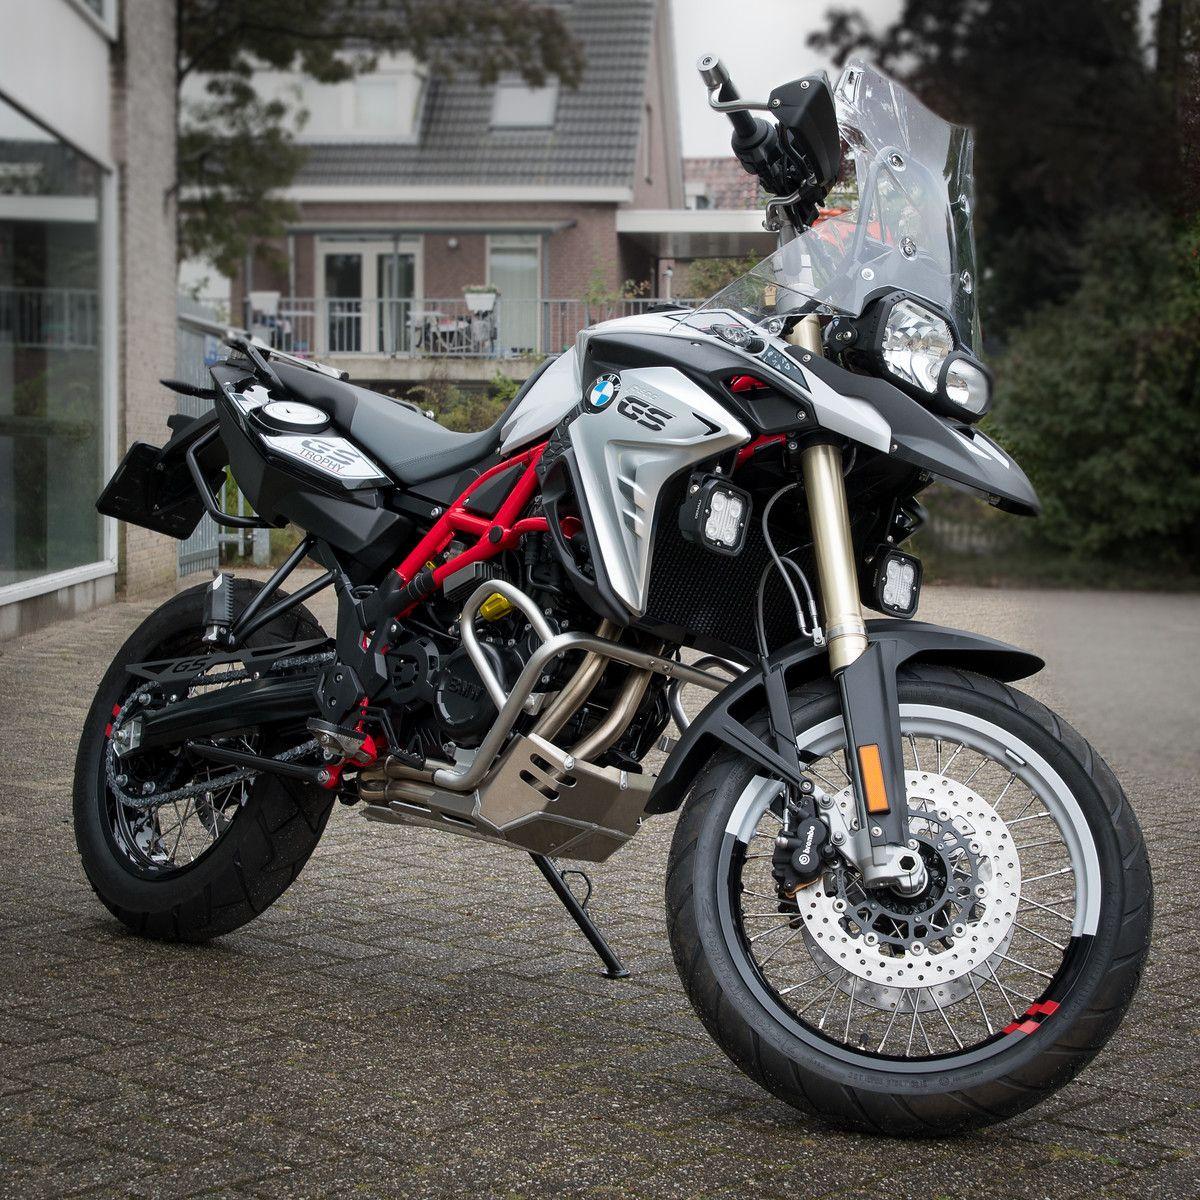 90 Motorcycles Idea Adventure Bike Motorcycle Adventure Motorcycling